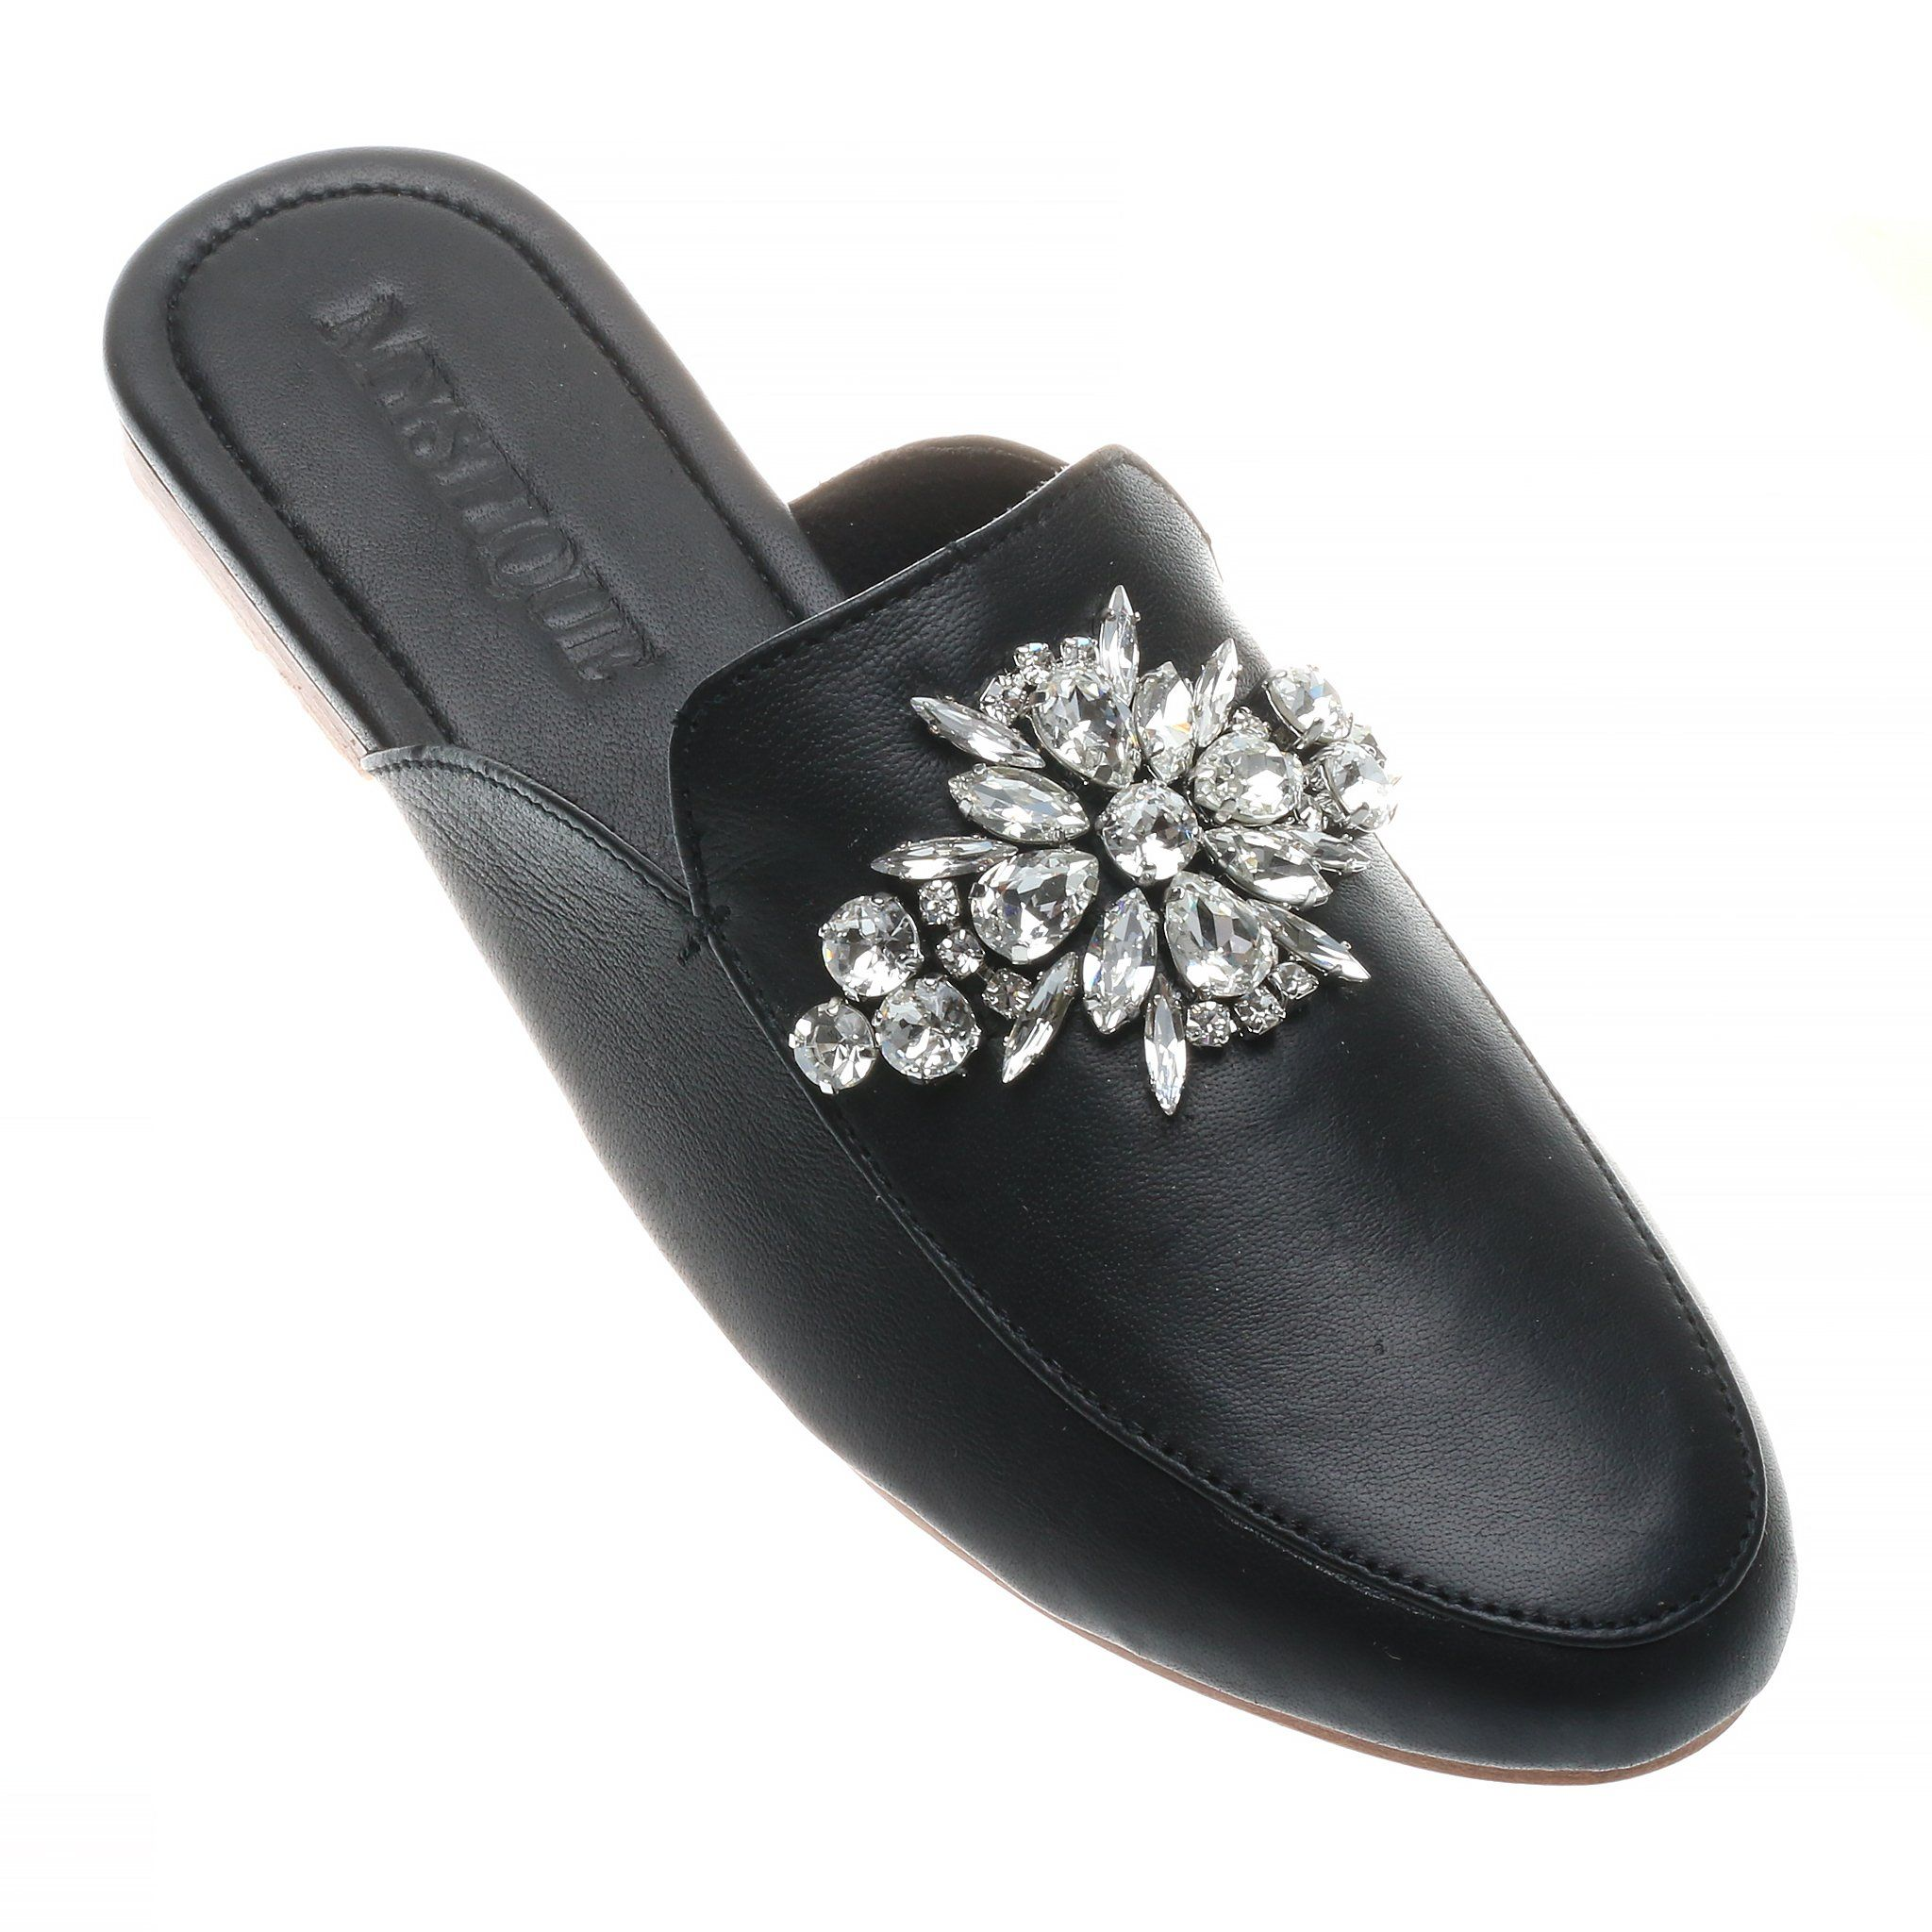 b3849f4ffa5d71 Detroit - Women s Black Leather Jeweled Mules